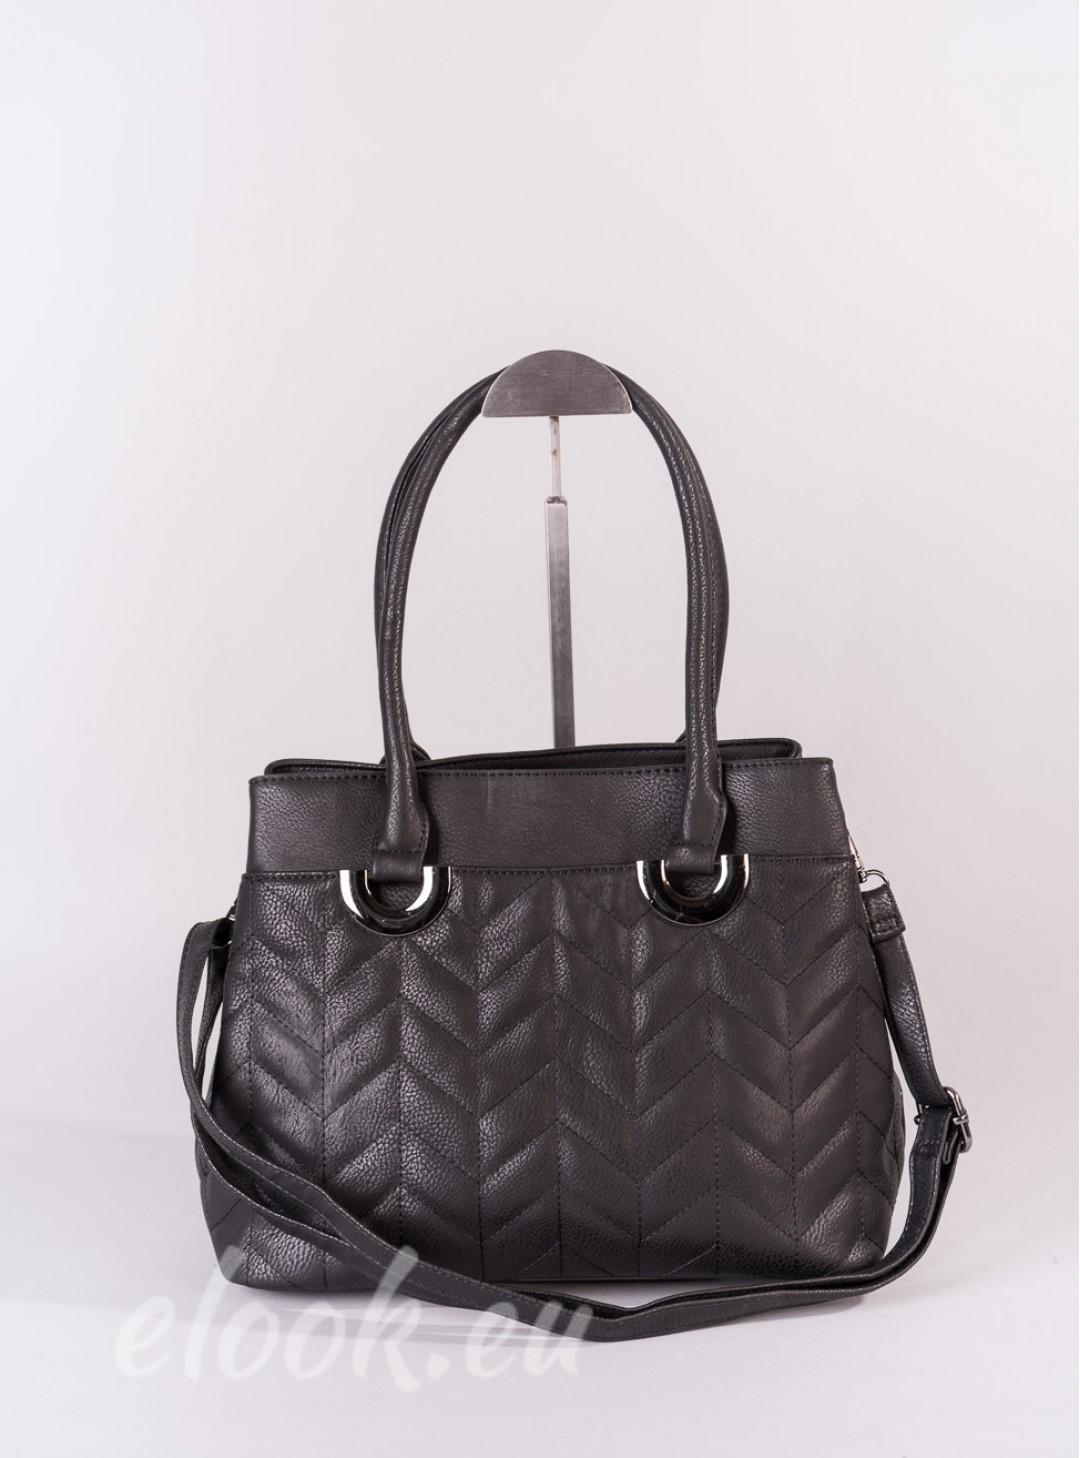 Bag, classic trapezoidal shape...